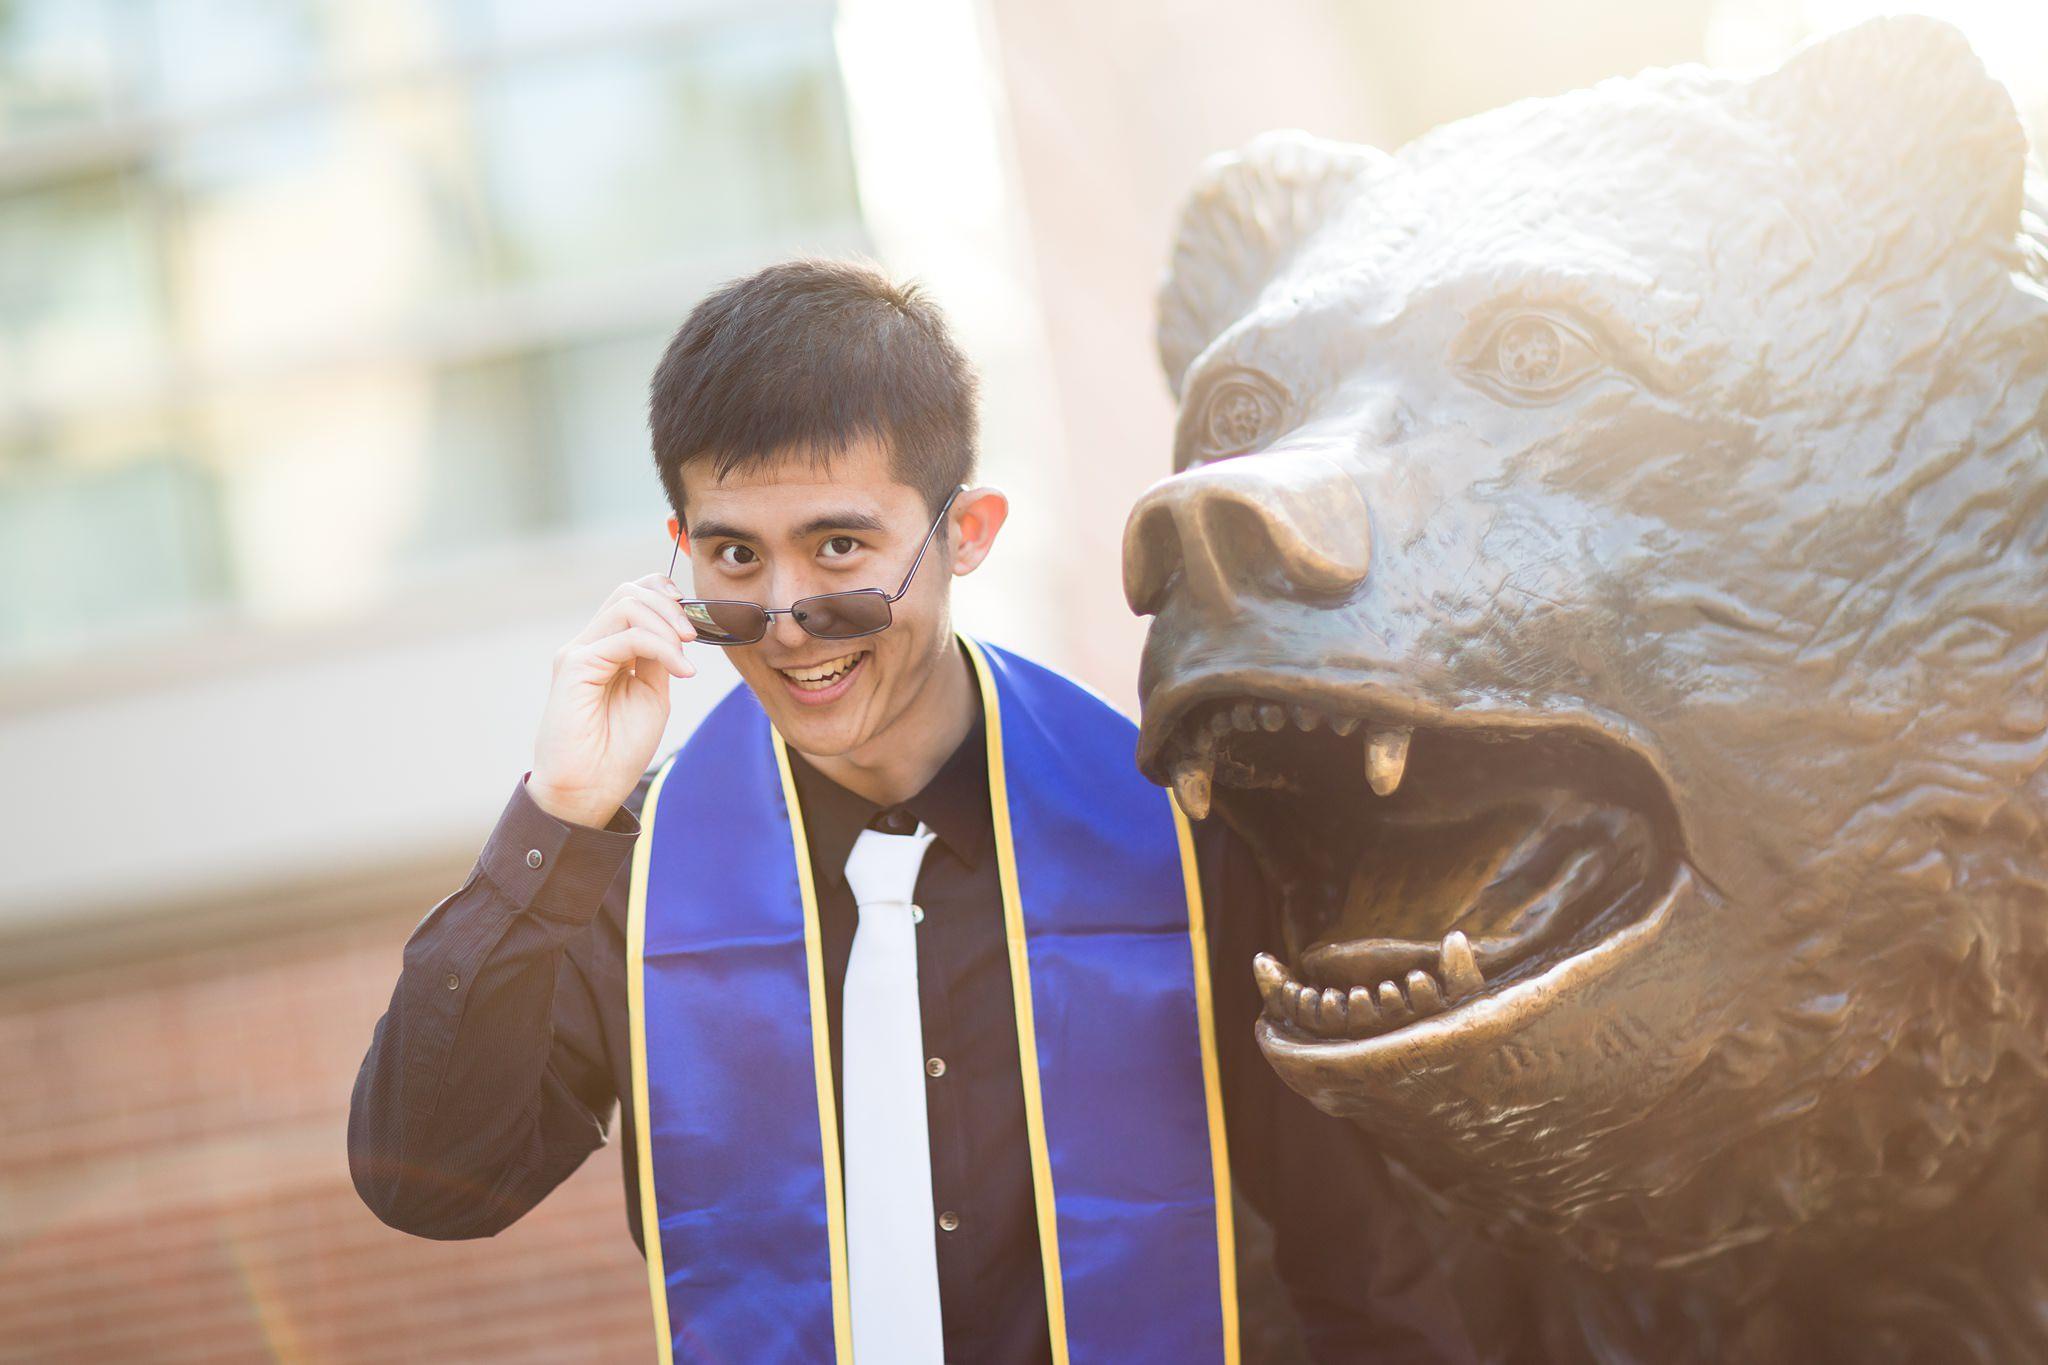 los-angeles-ucla-senior-graduation-portraits-at-bruin-bear-looking-over-glasses